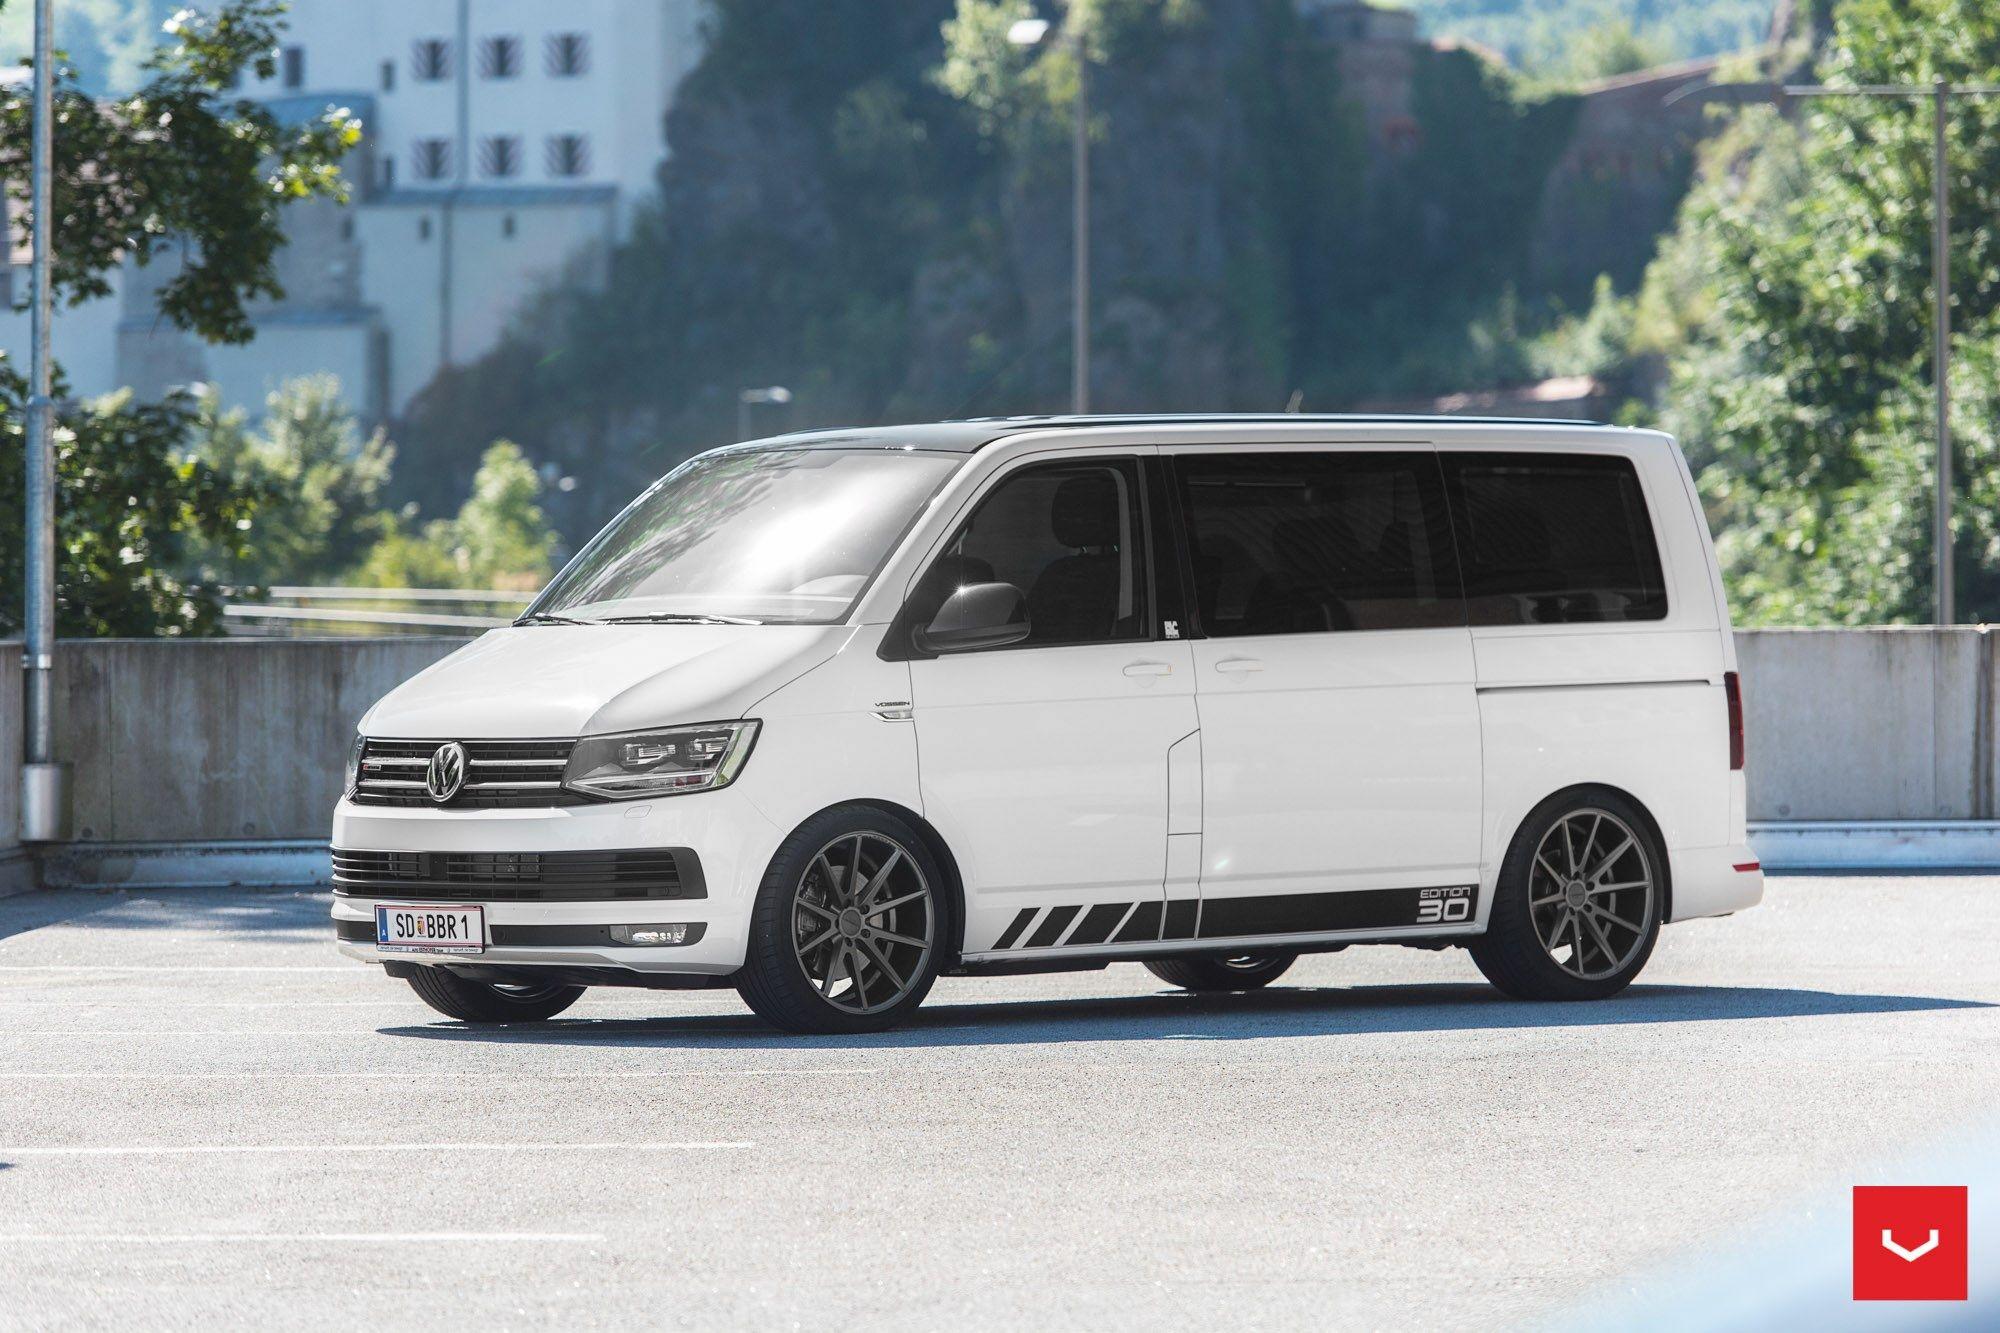 Vossen Wheels - VW T6 - VOSSEN FLOW FORMED SERIES: VFS1 | VW